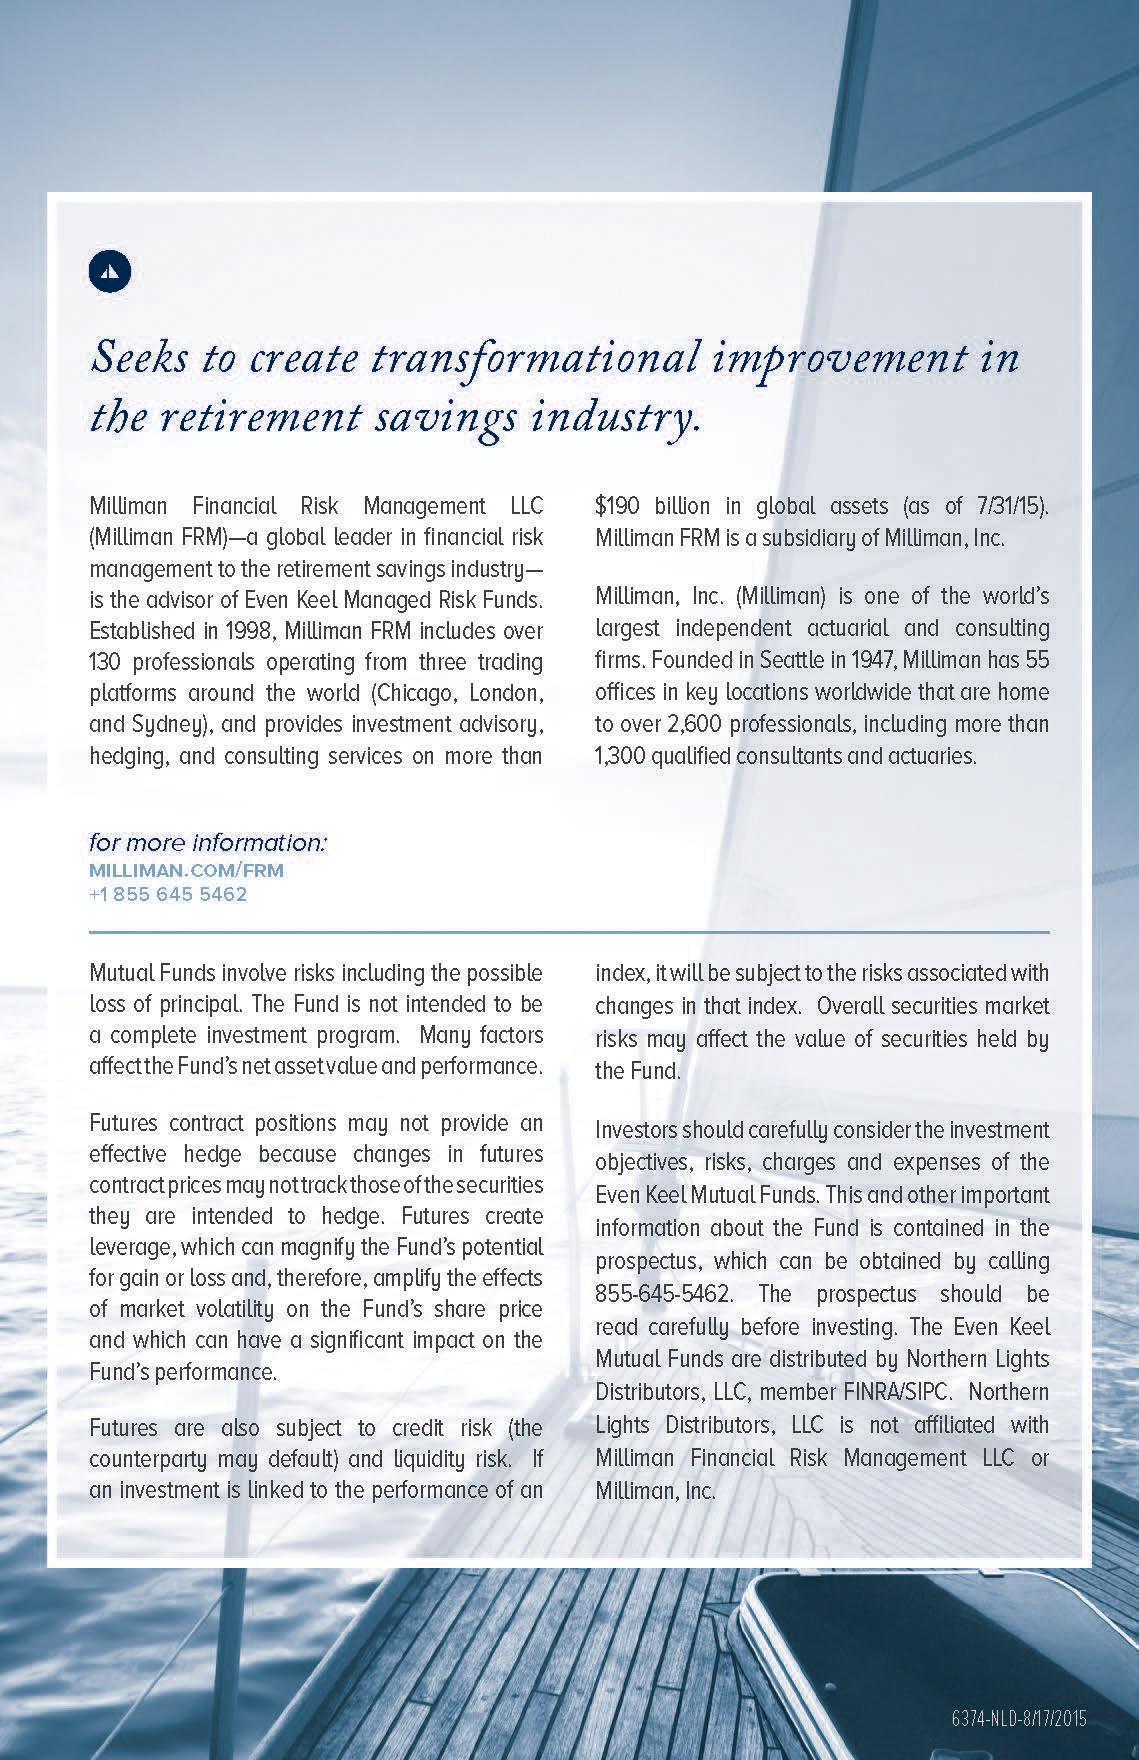 Even Keel Investments - Investor Guide Mailer on Behance